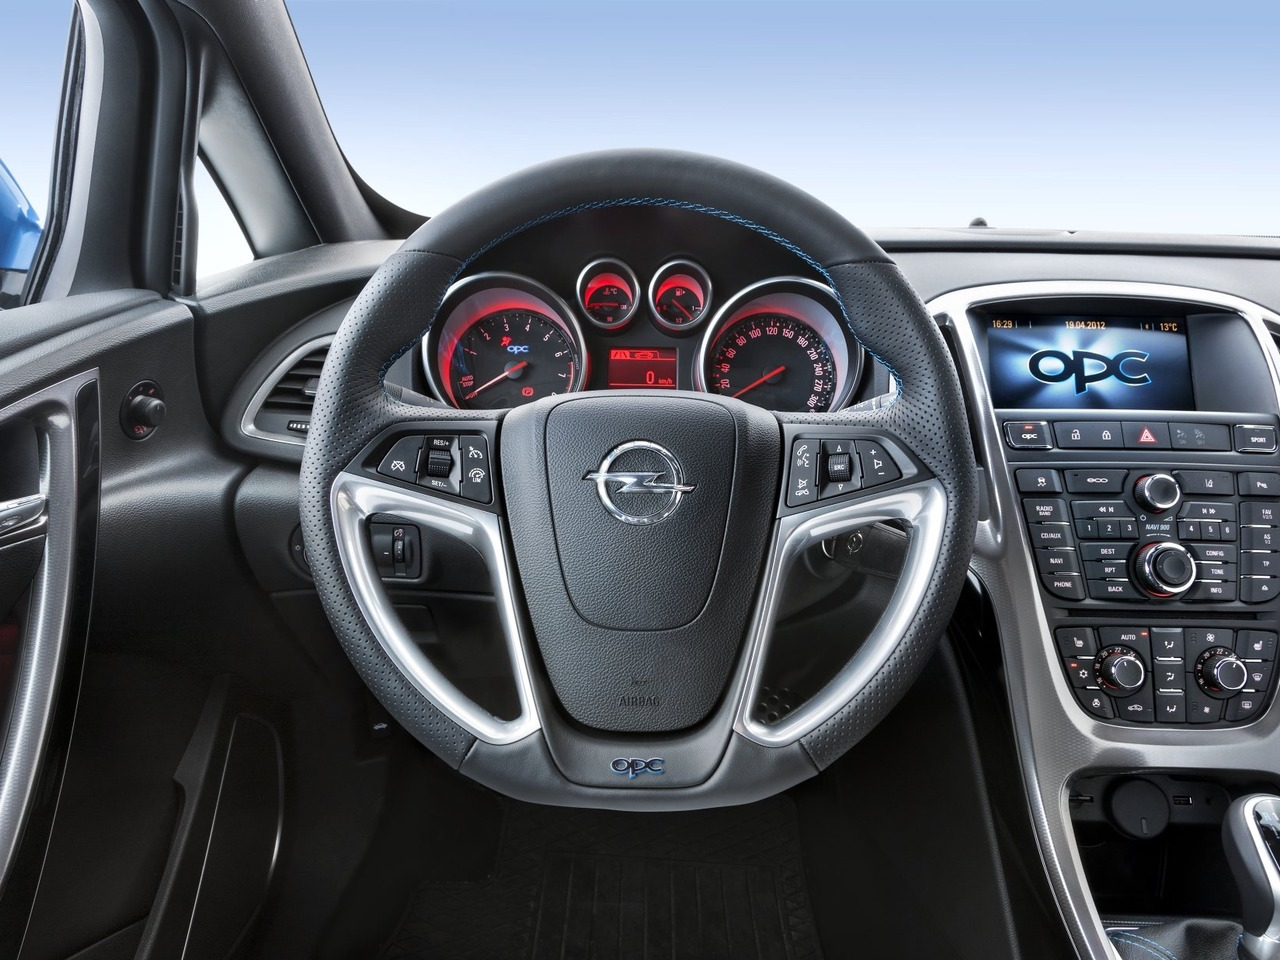 Снимки: Opel Astra J OPC